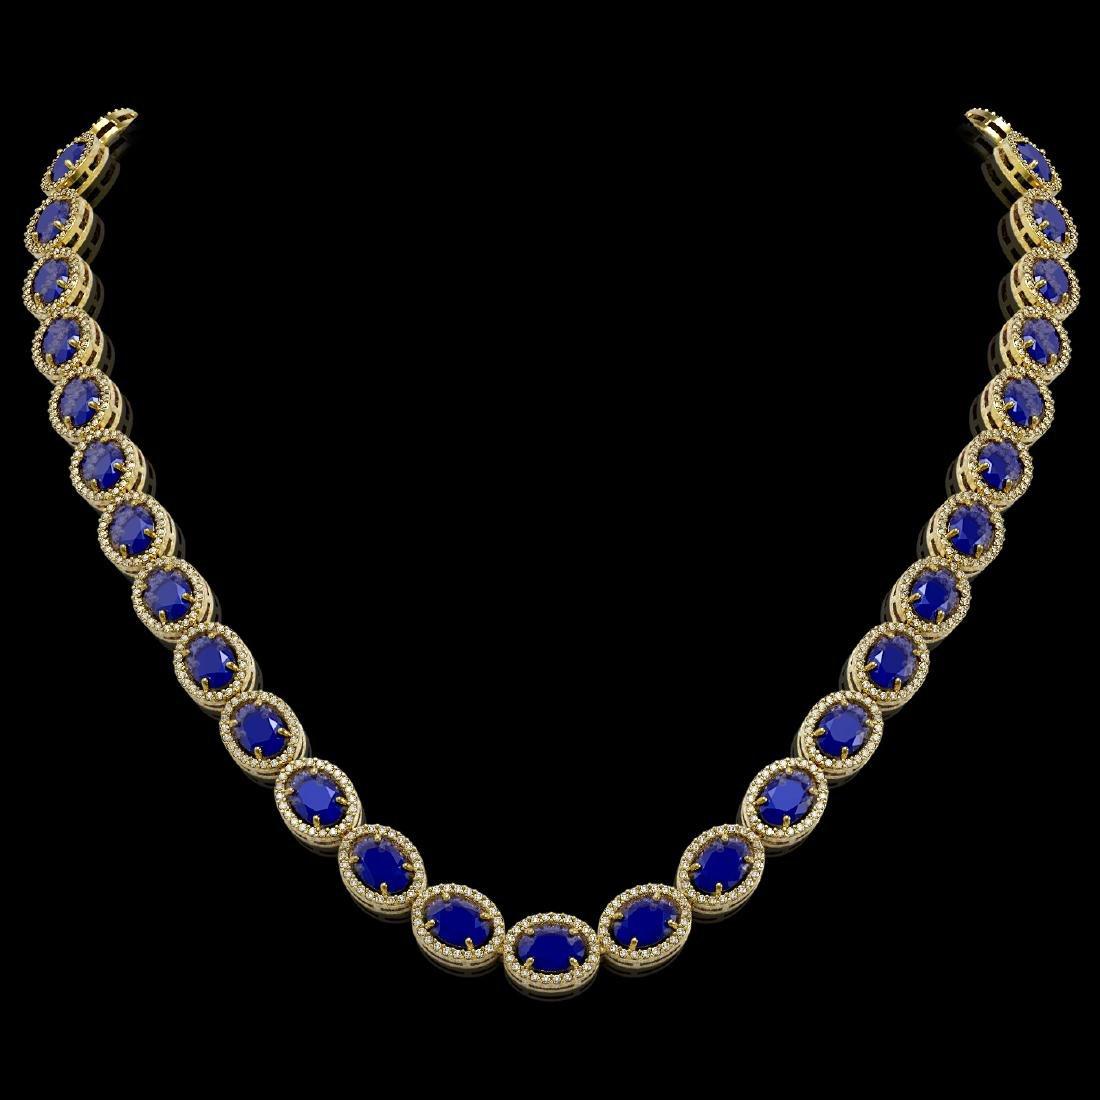 52.15 CTW Sapphire & Diamond Halo Necklace 10K Yellow